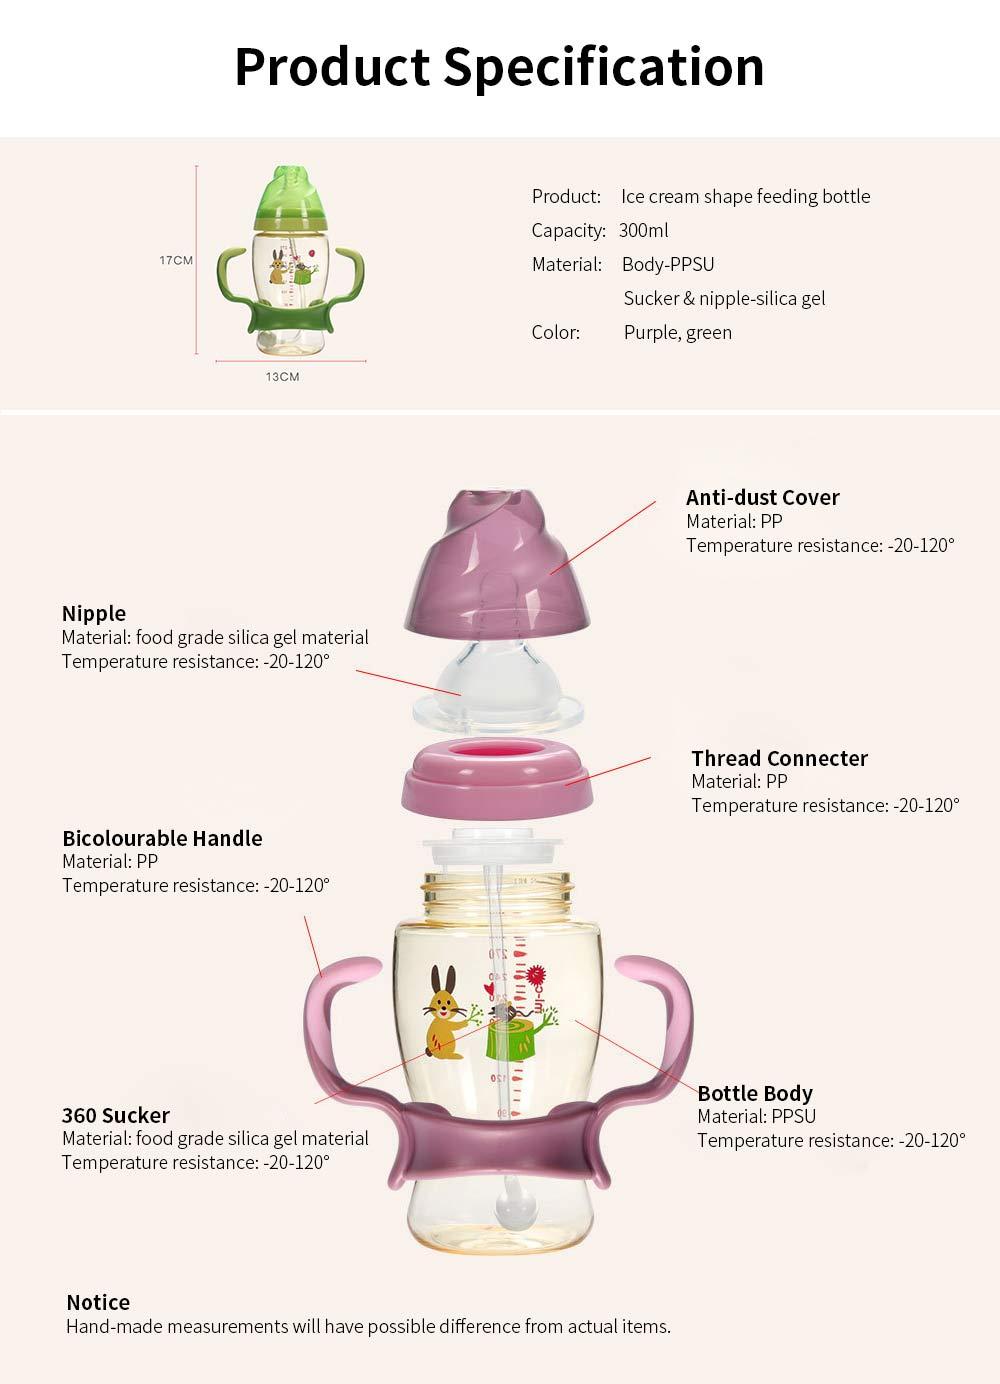 Nurser for New-born Infant Wide Mouth Feeder Avoid Flatulence Baby Care Large-size Nursing Bottle PPSU Anti-impact Feeding Bottle 7